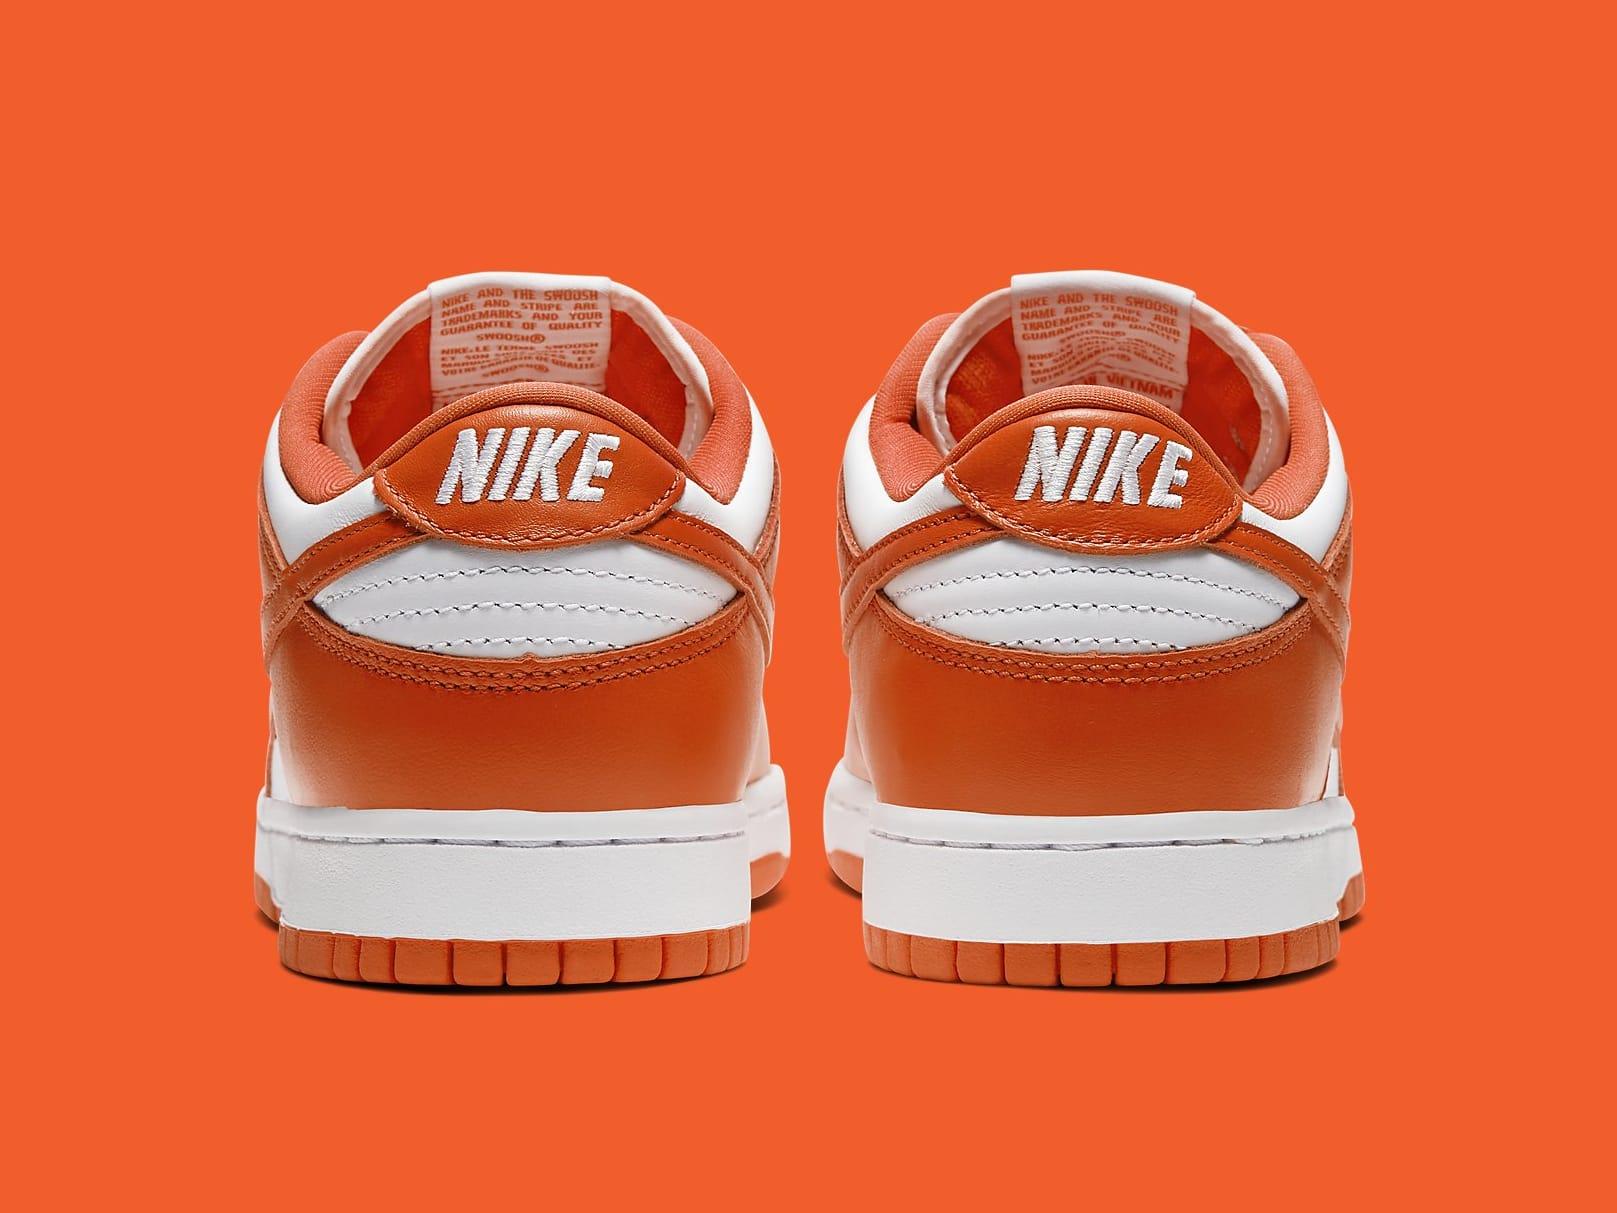 Nike Dunk Low Syracuse Release Date CU1726-101 Heel